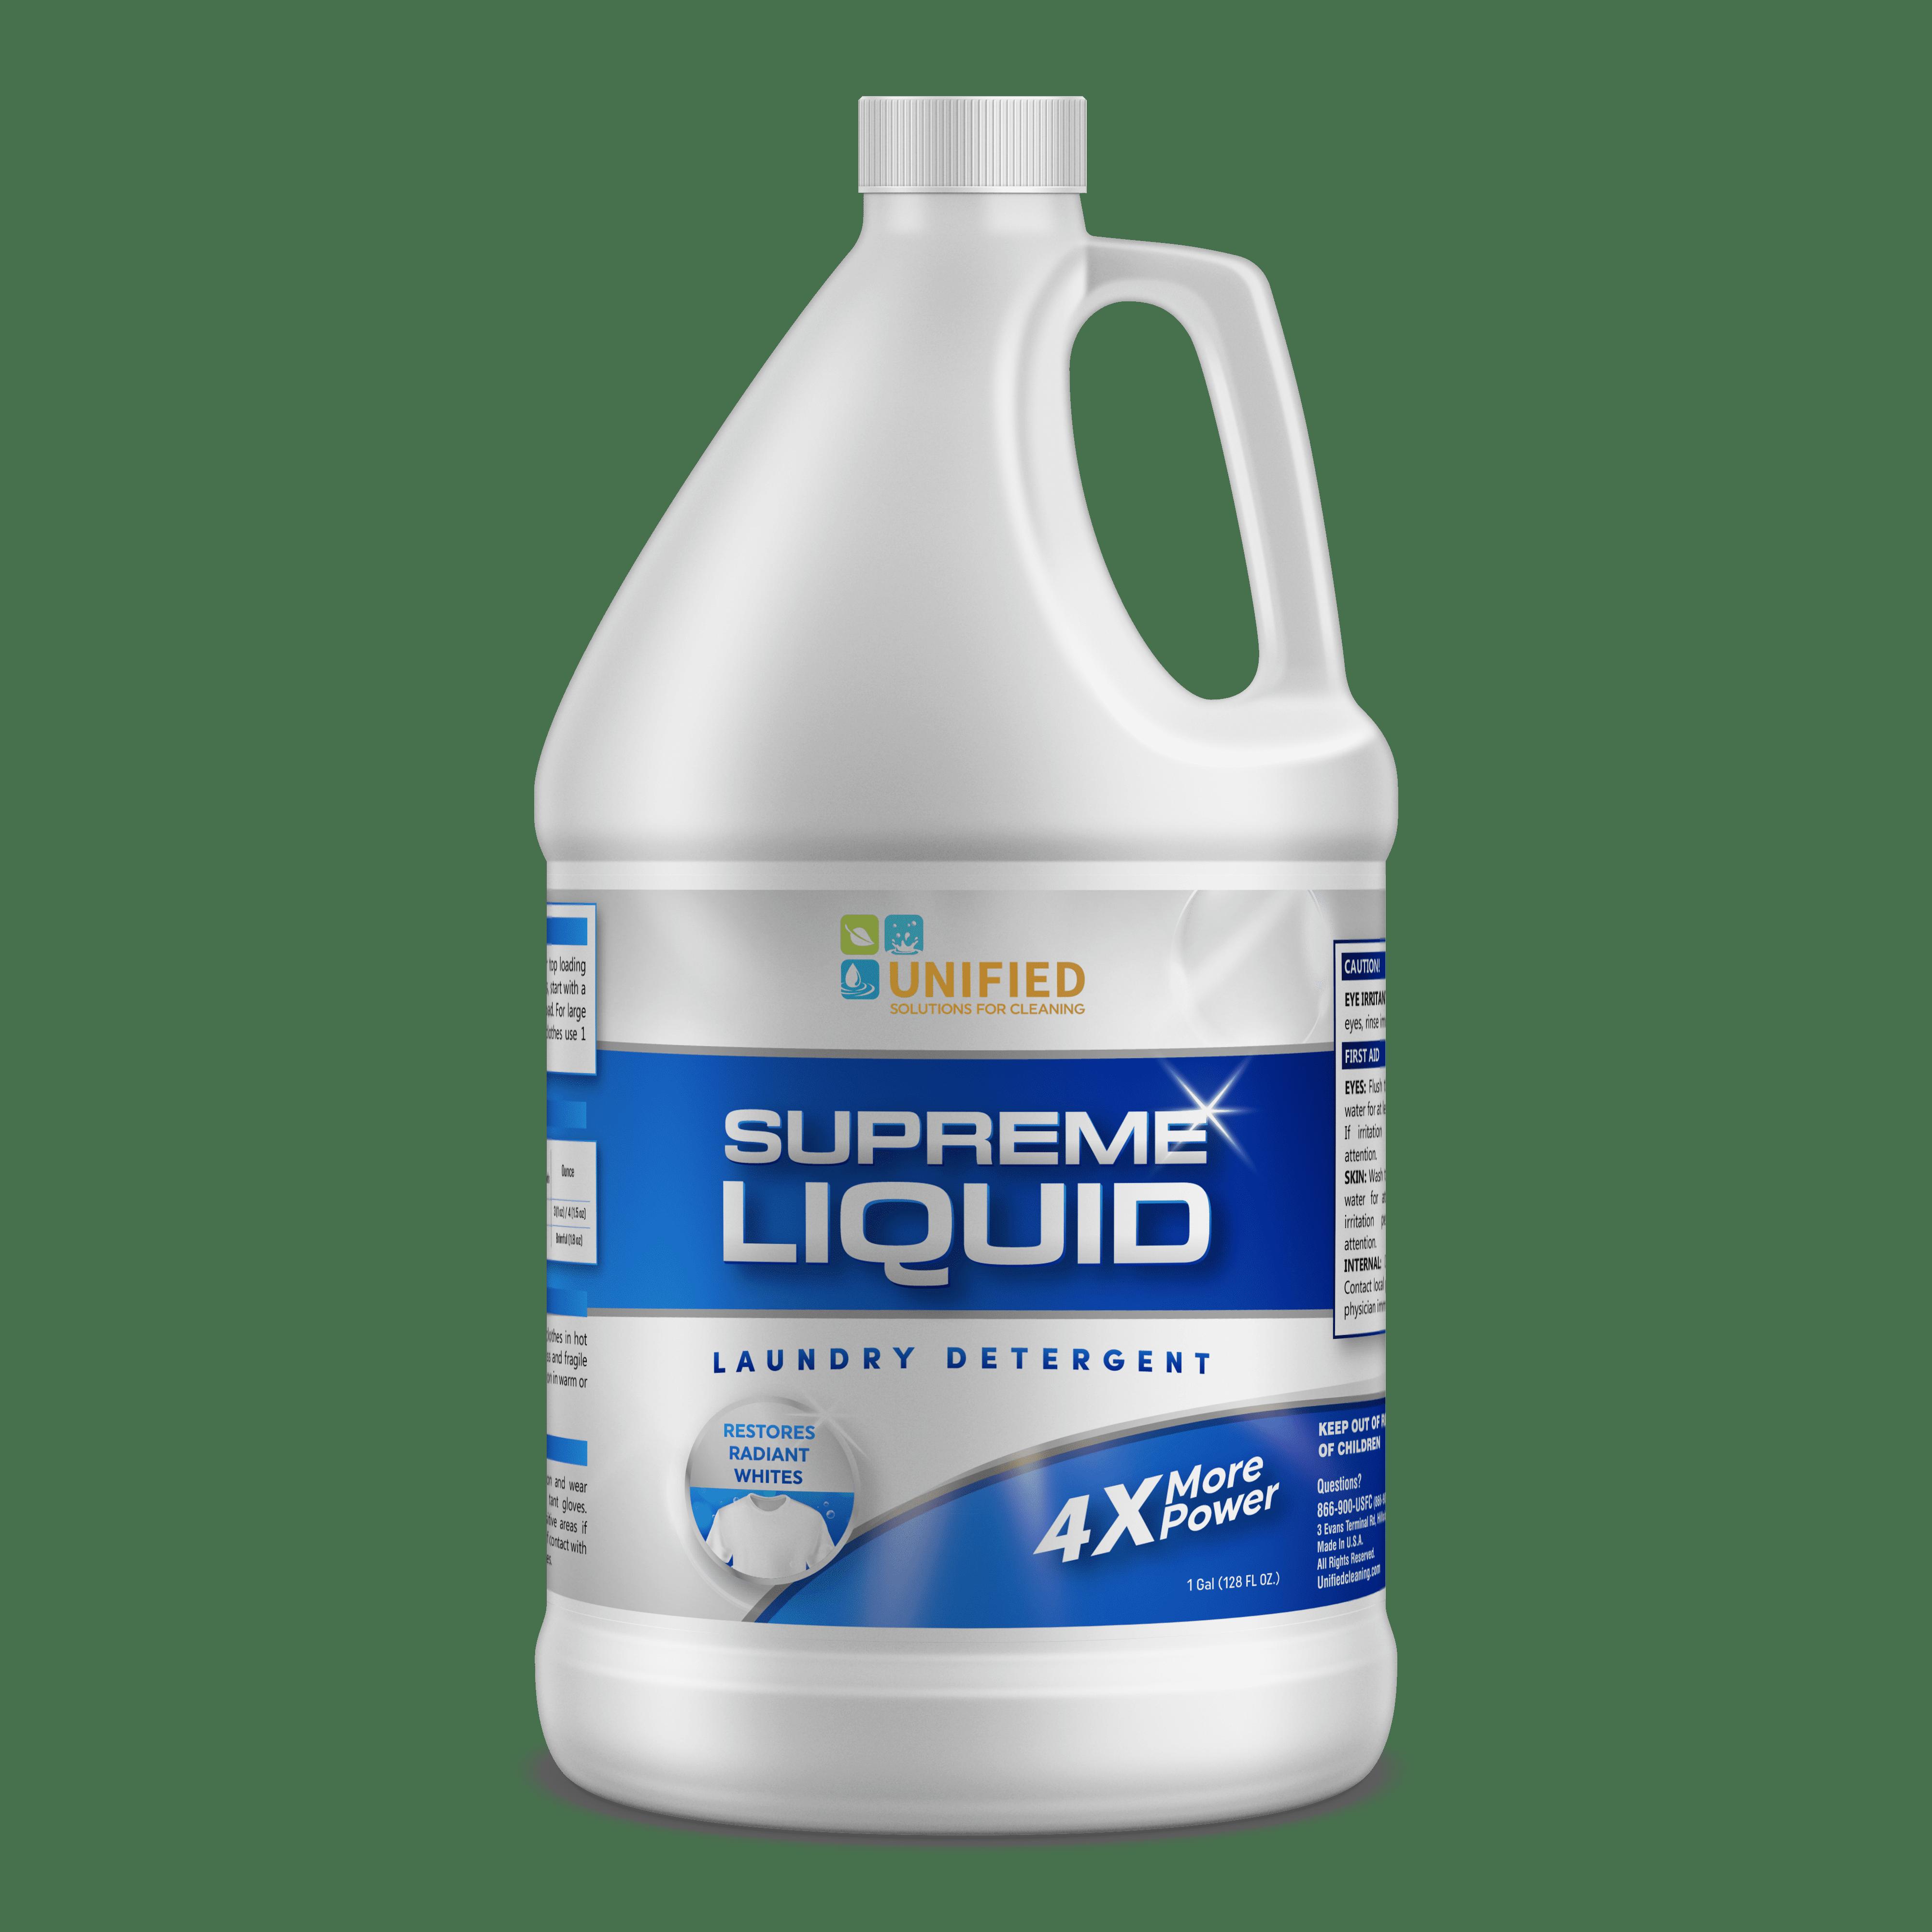 SUPREME_LIQUID Laundry Deteregent